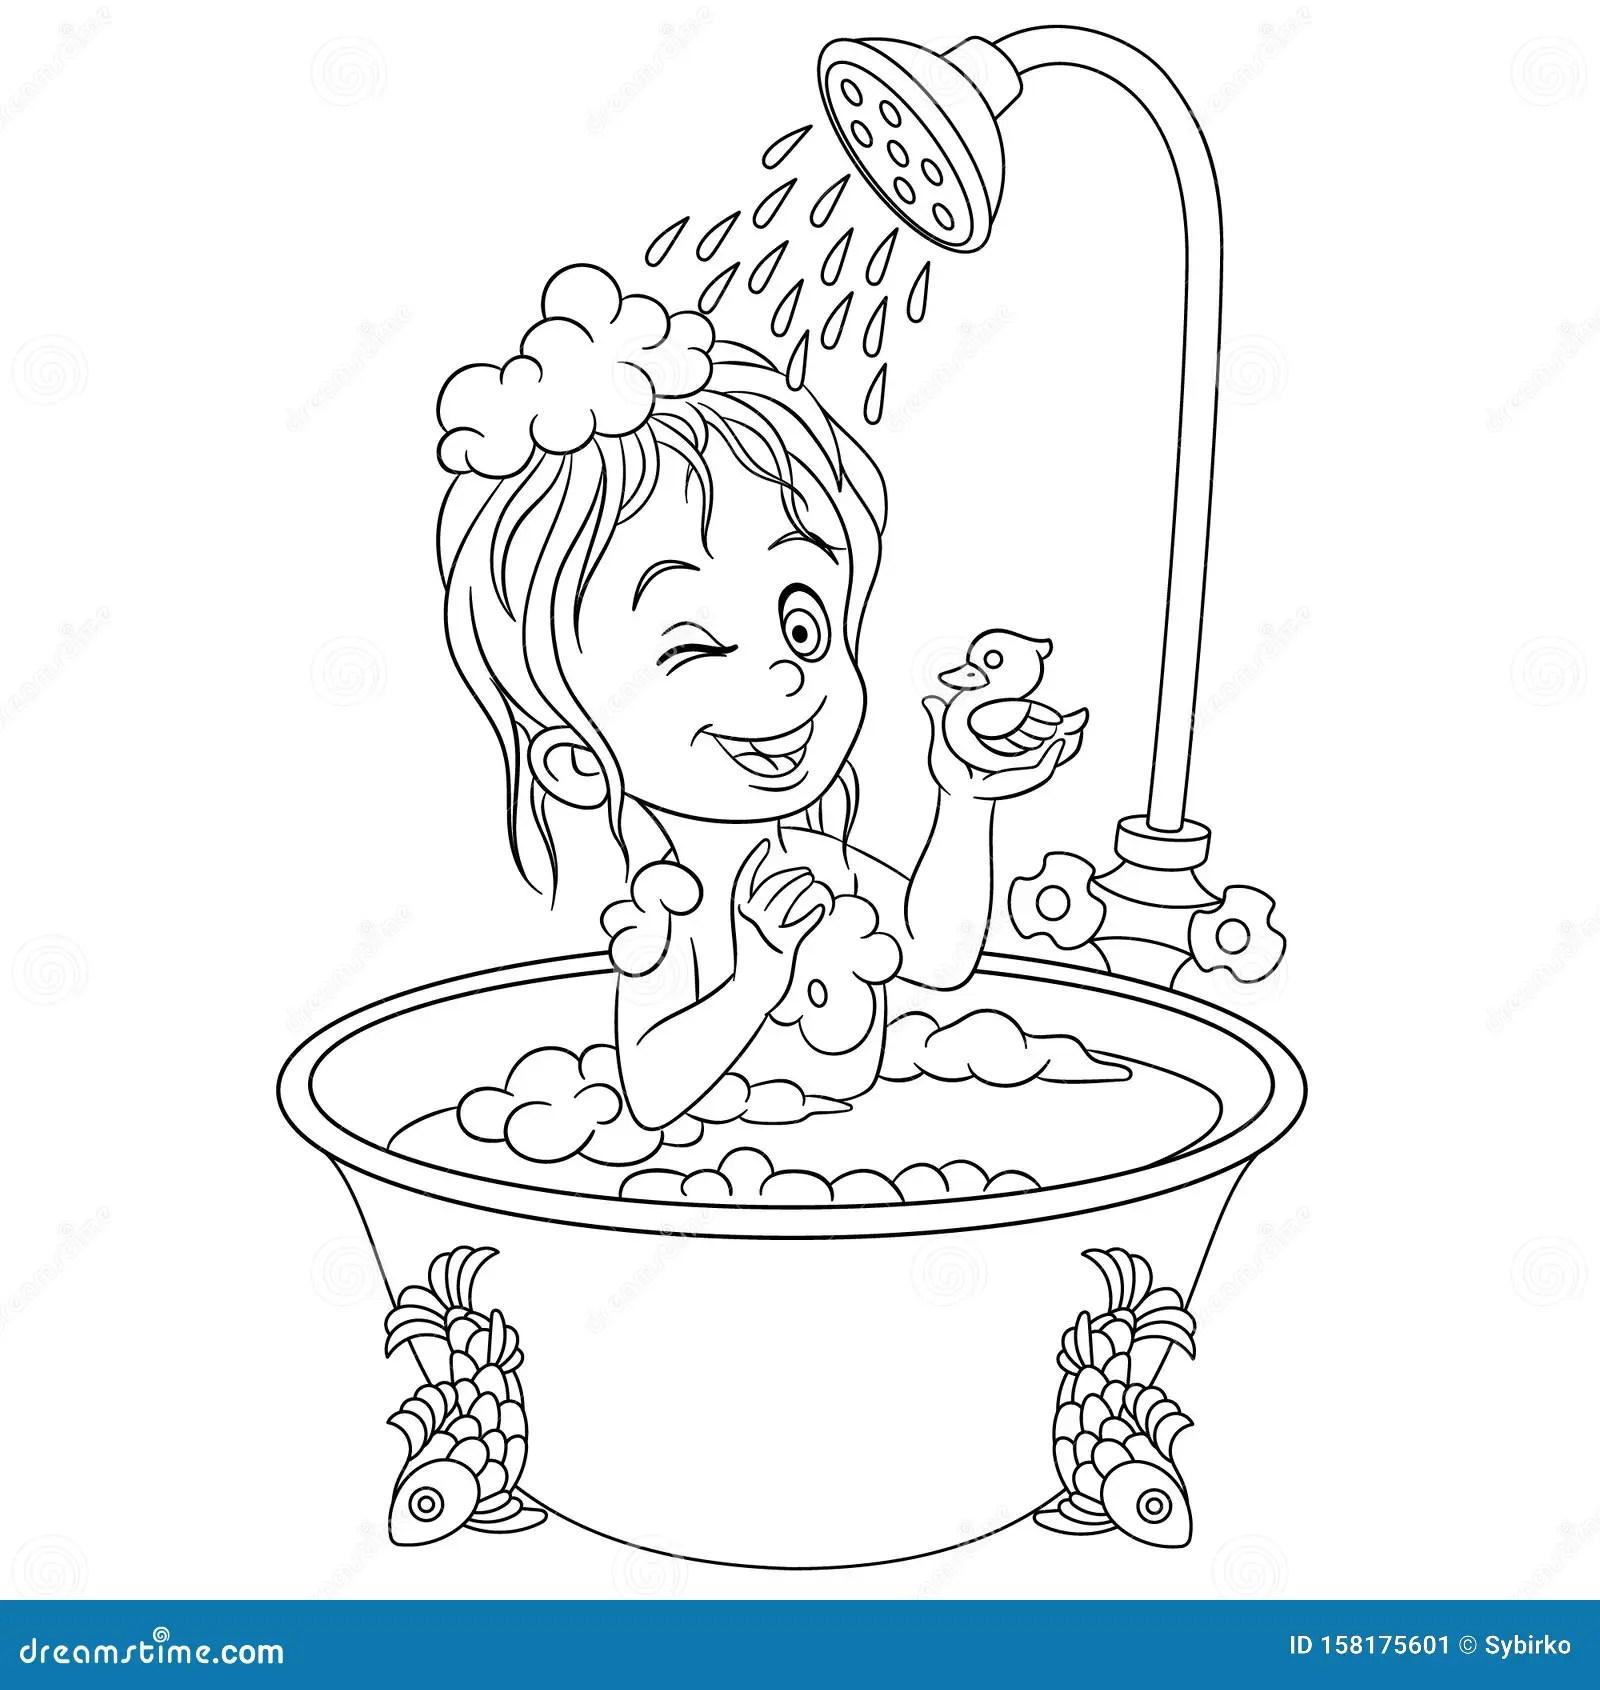 https fr dreamstime com page coloriage fille salle bain prenant douche image158175601